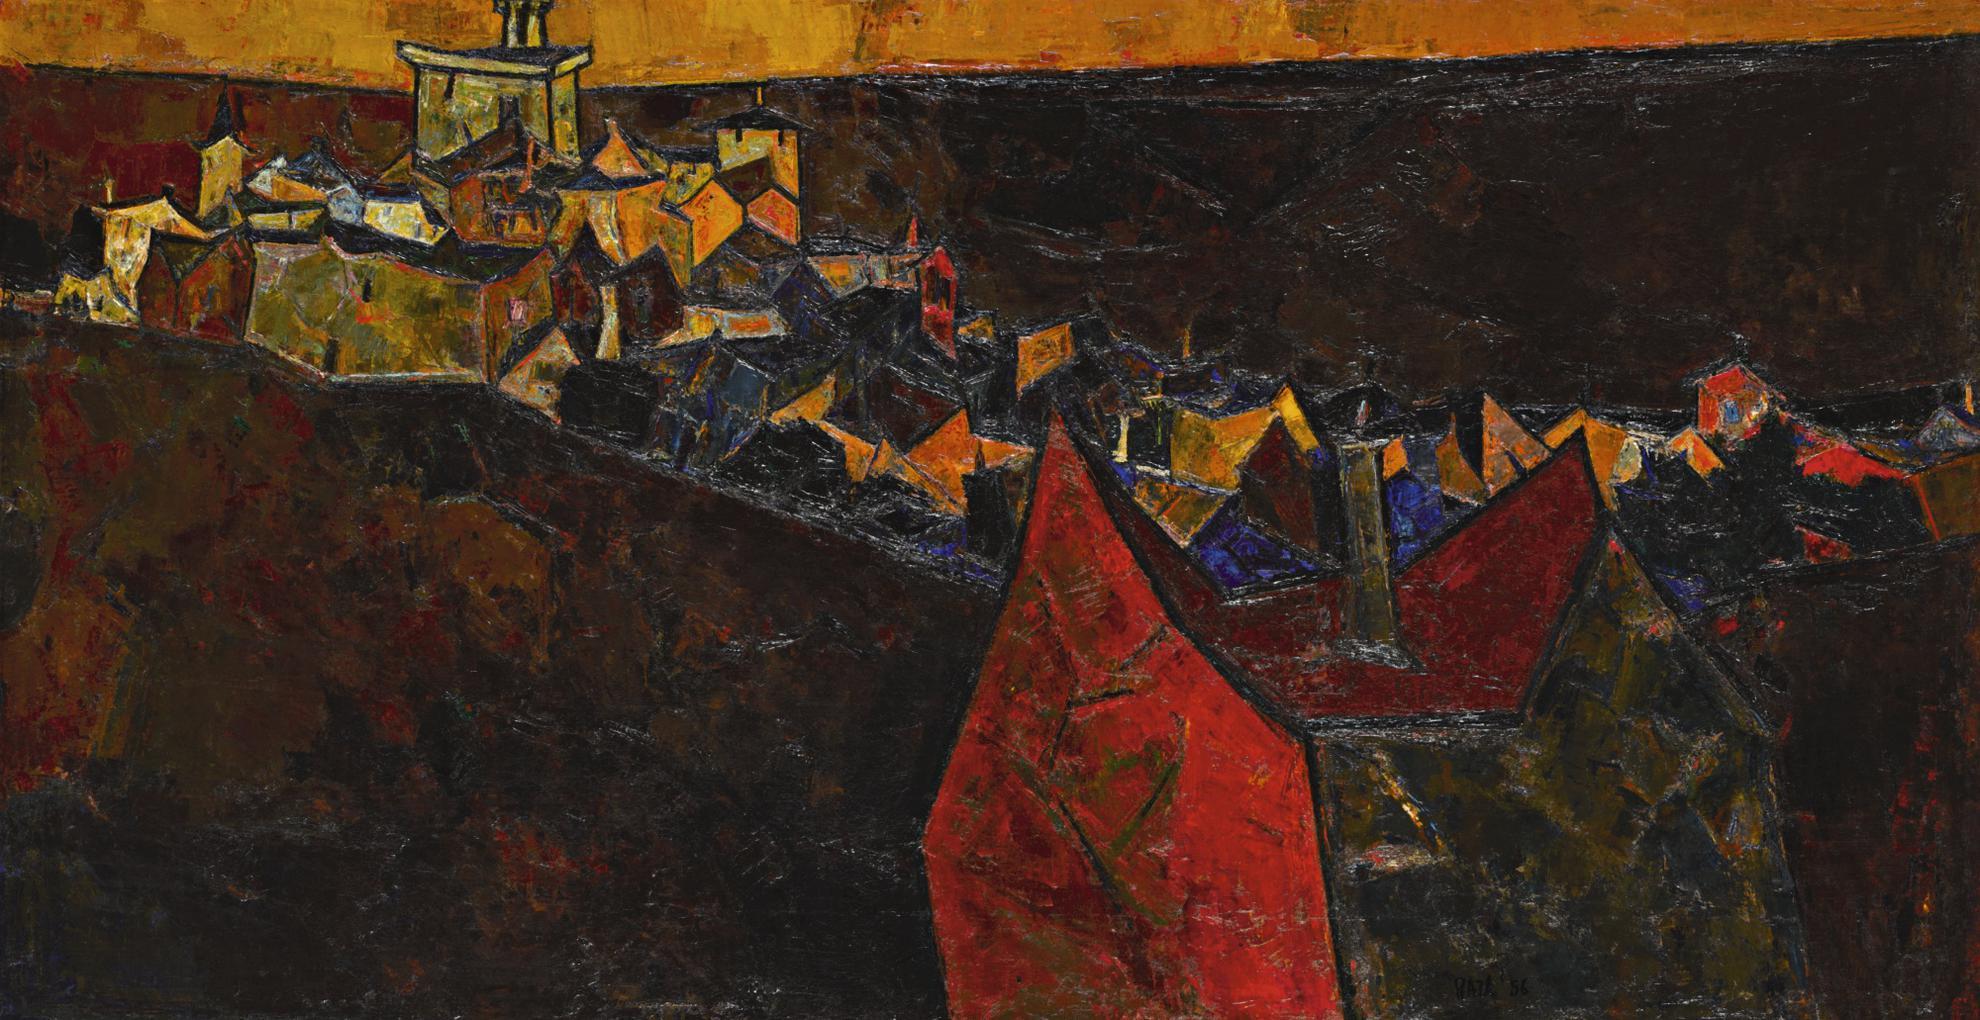 Sayed Haider Raza-Ville Provencale-1956